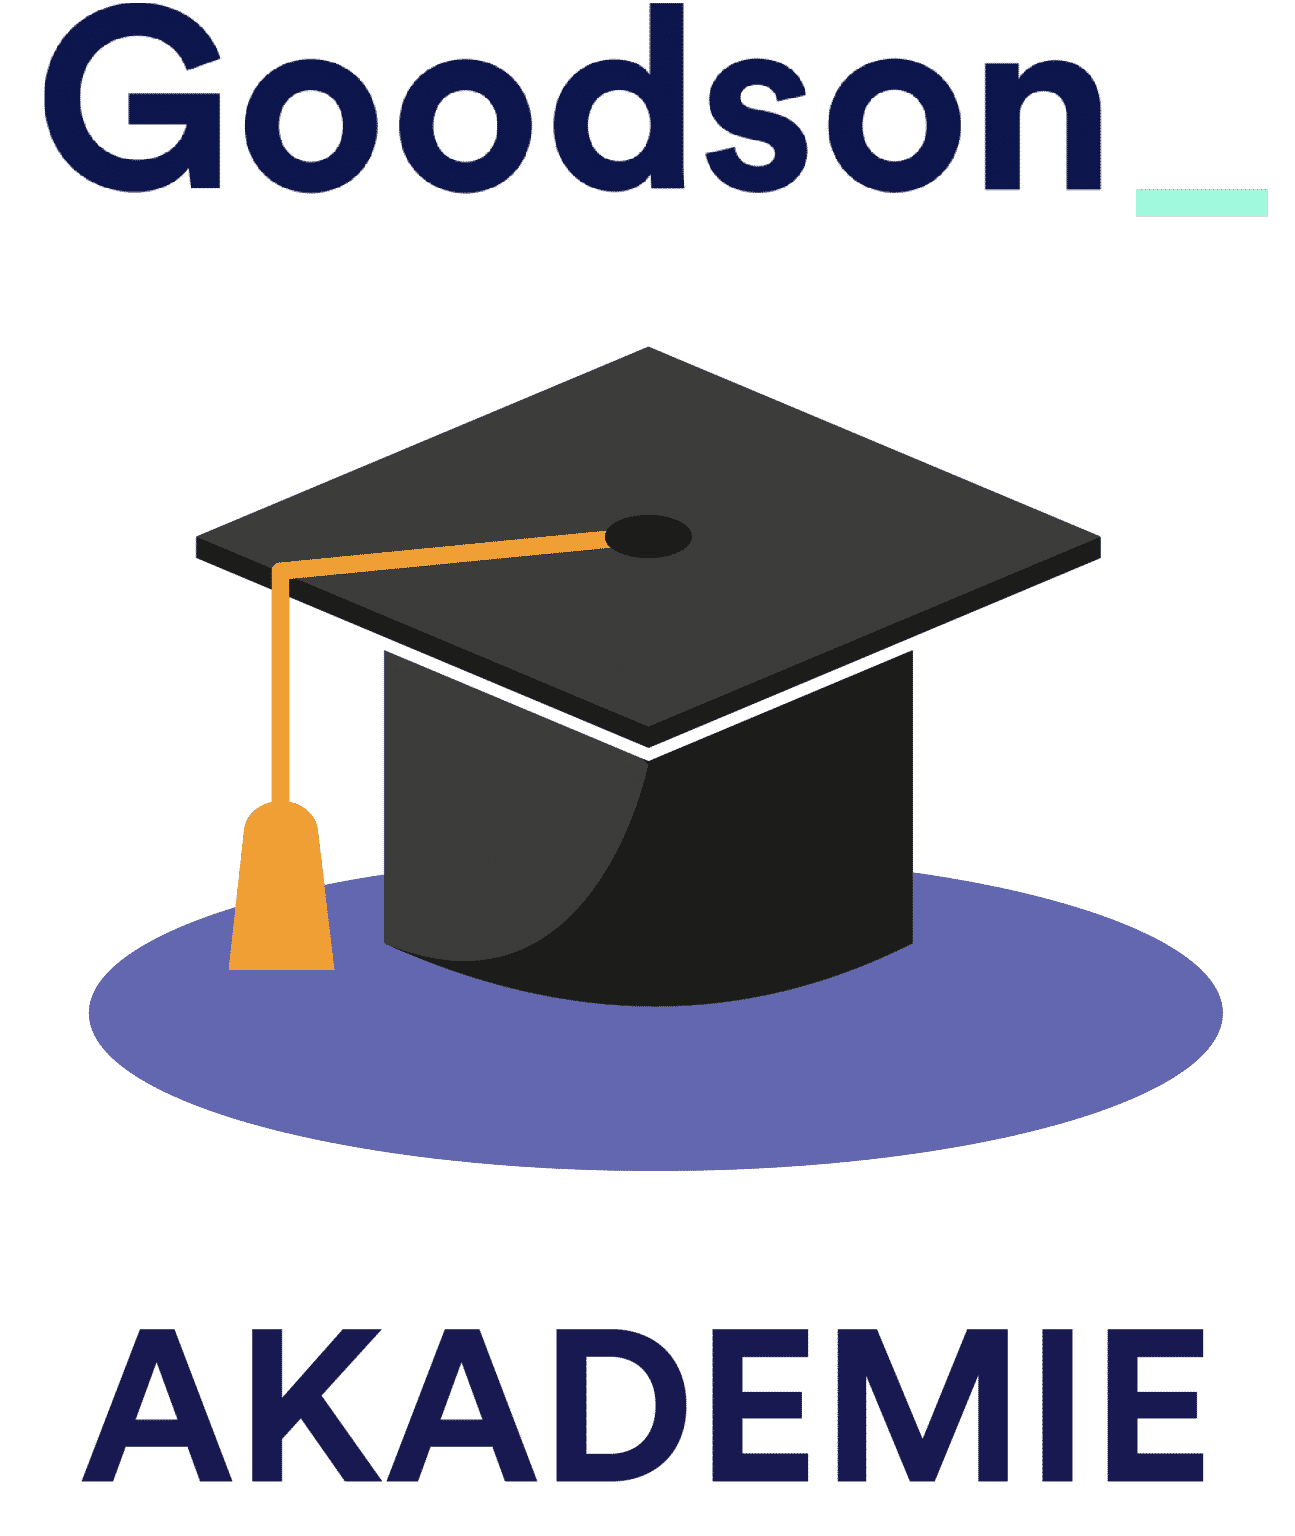 Goodson Akademie